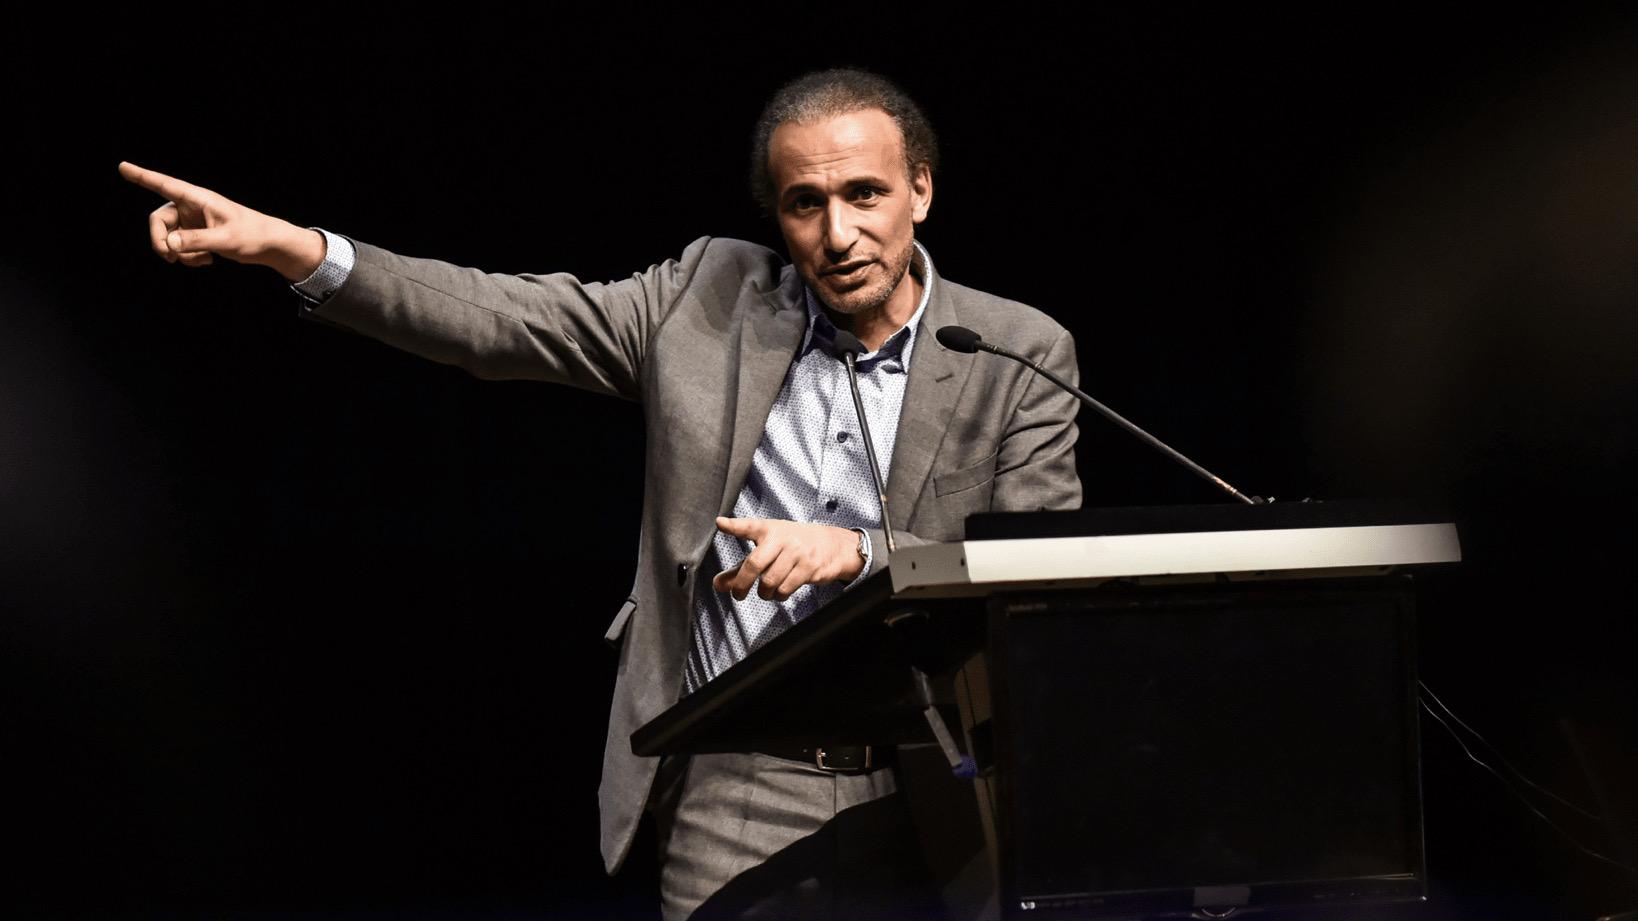 L'European Muslim Network de Tariq Ramadan : la fin d'une coquille vide !